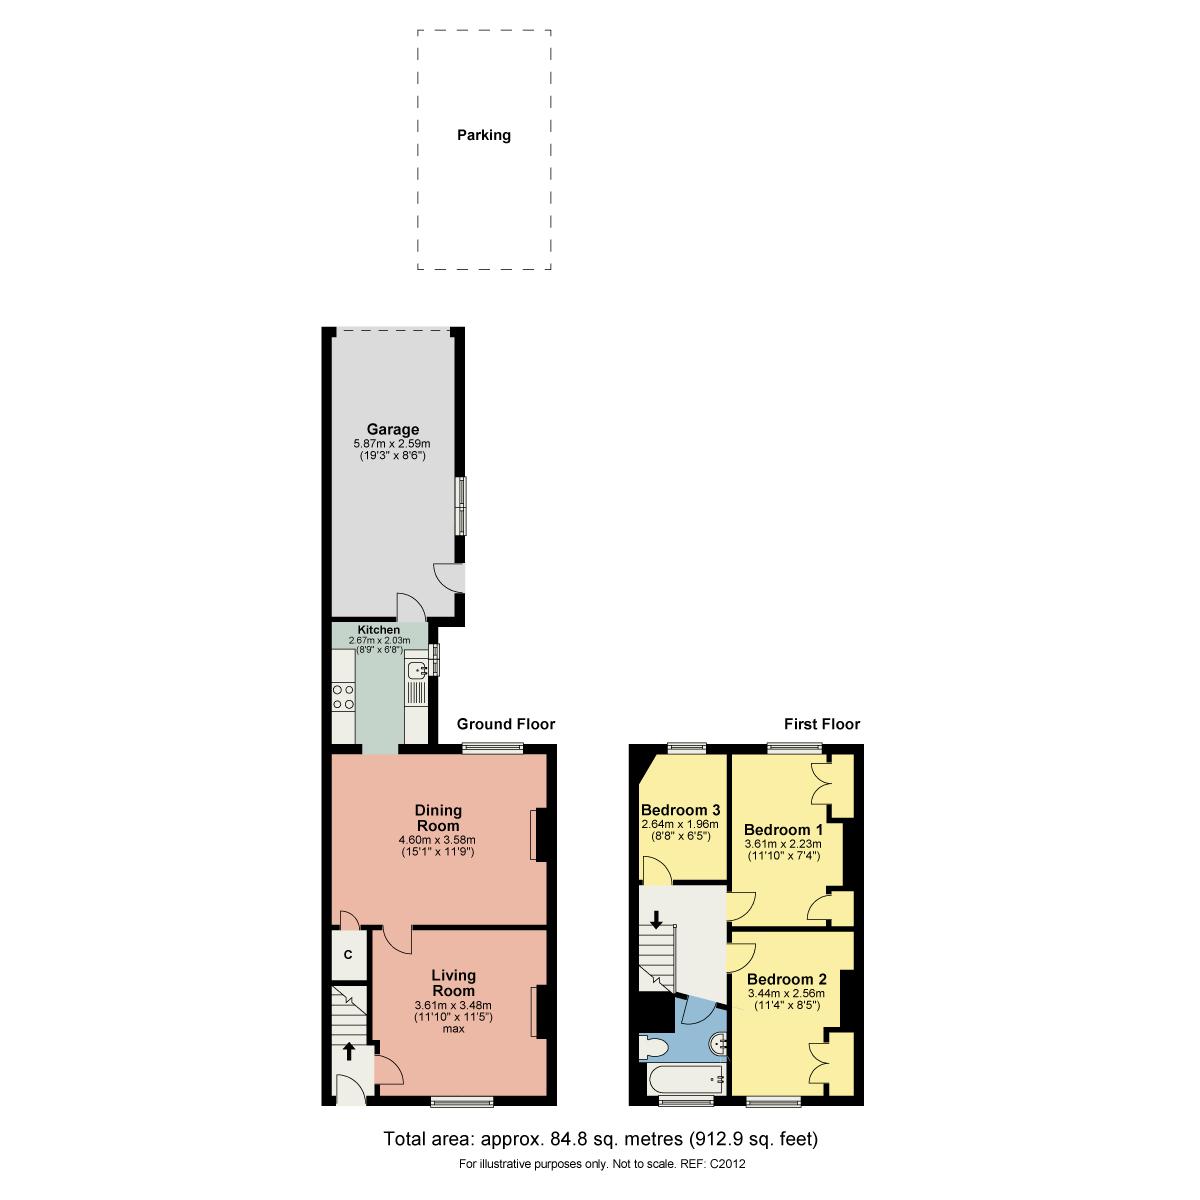 Floorplan Grosvenor Place, Carnforth, Lancashire, LA5 9DL